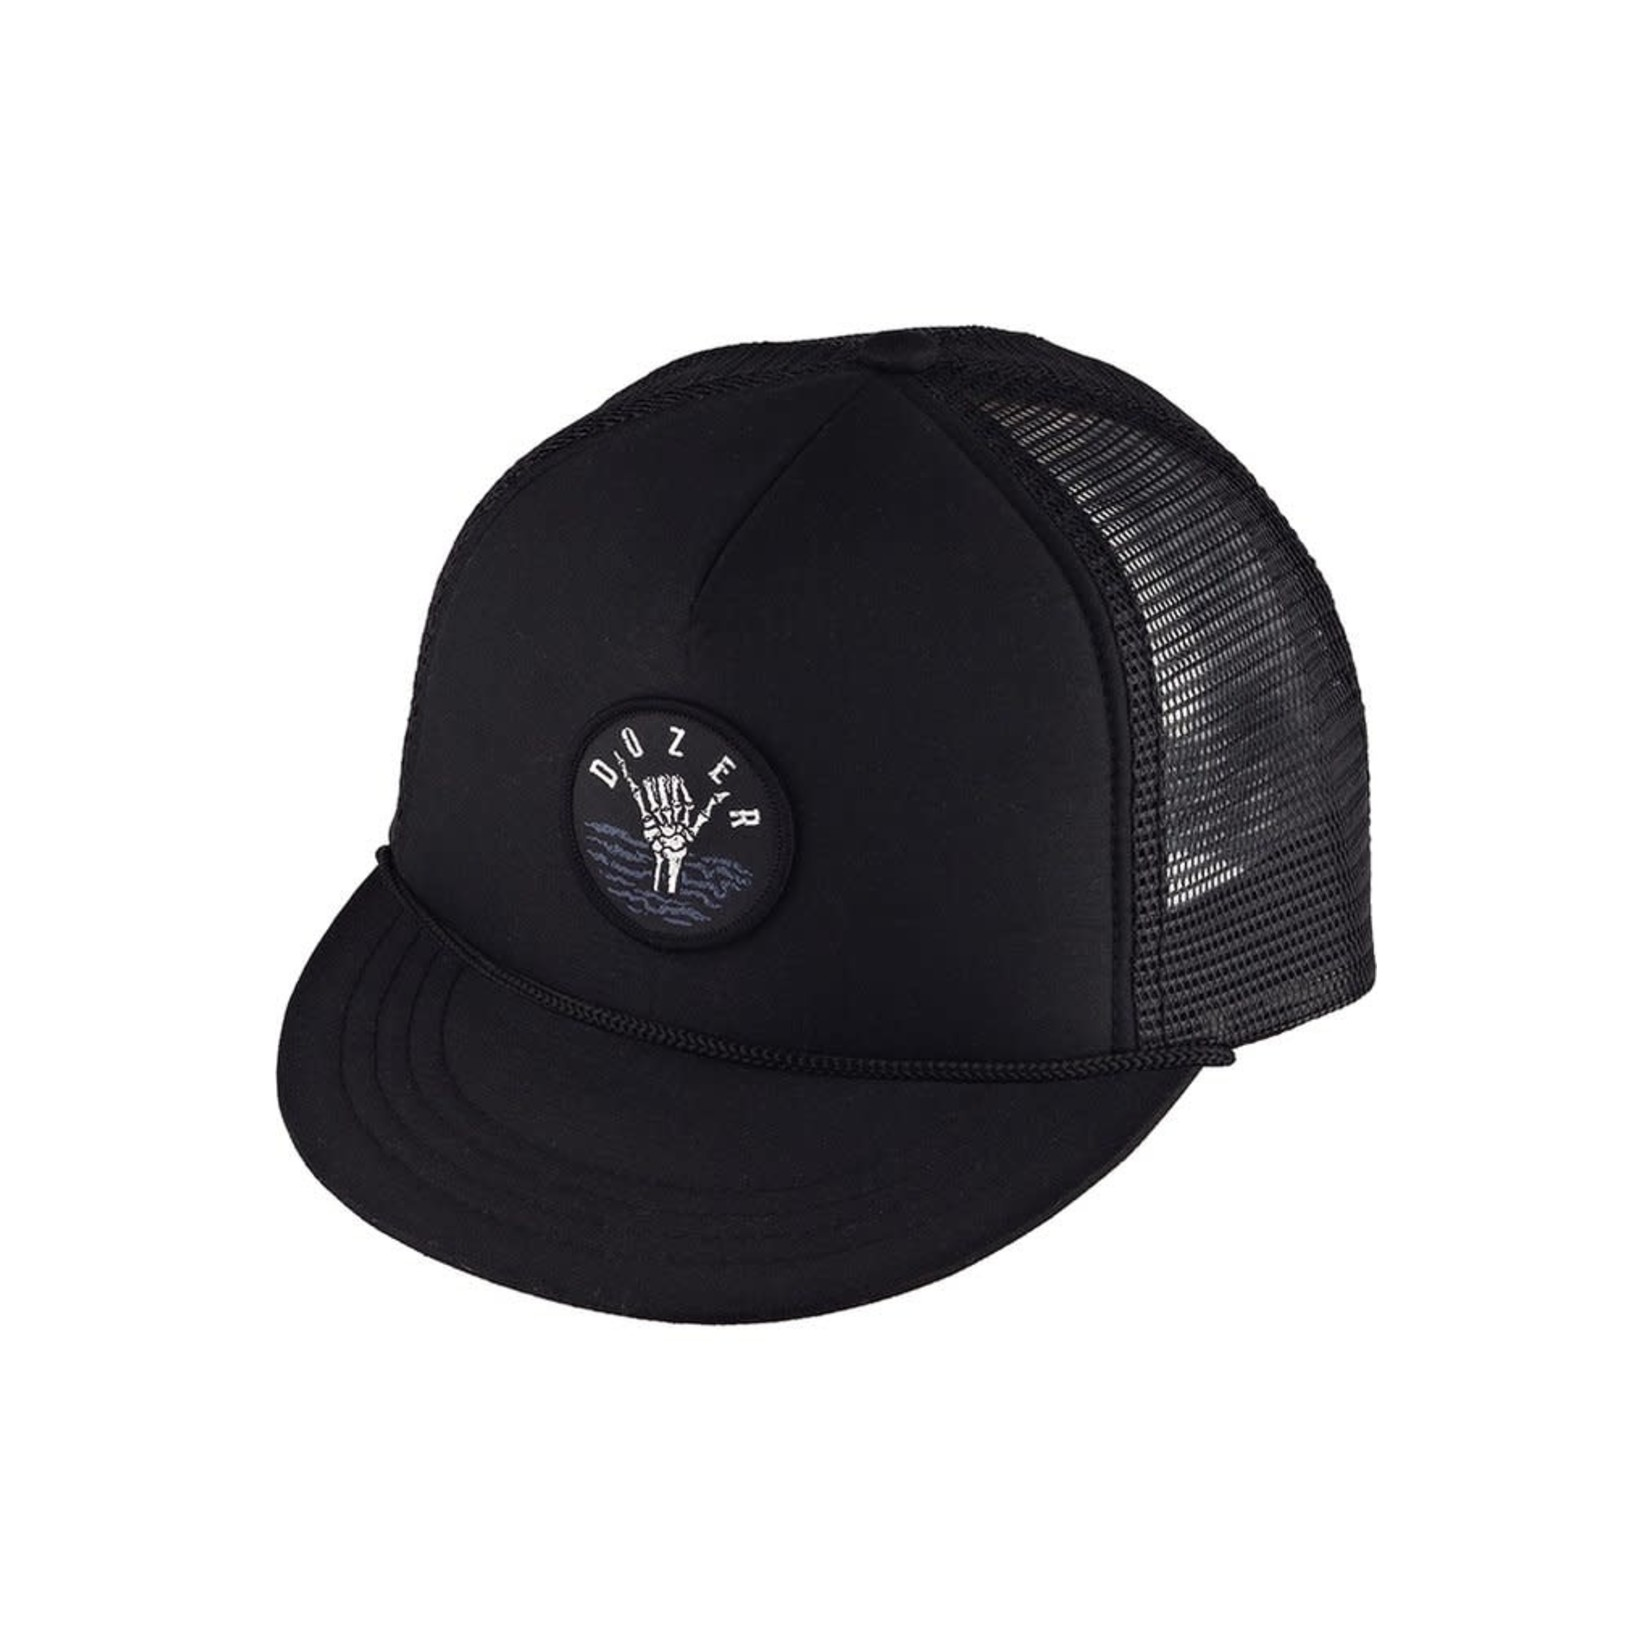 Millymook and Dozer Boys Trucker Sun Cap, Knox Black - OS